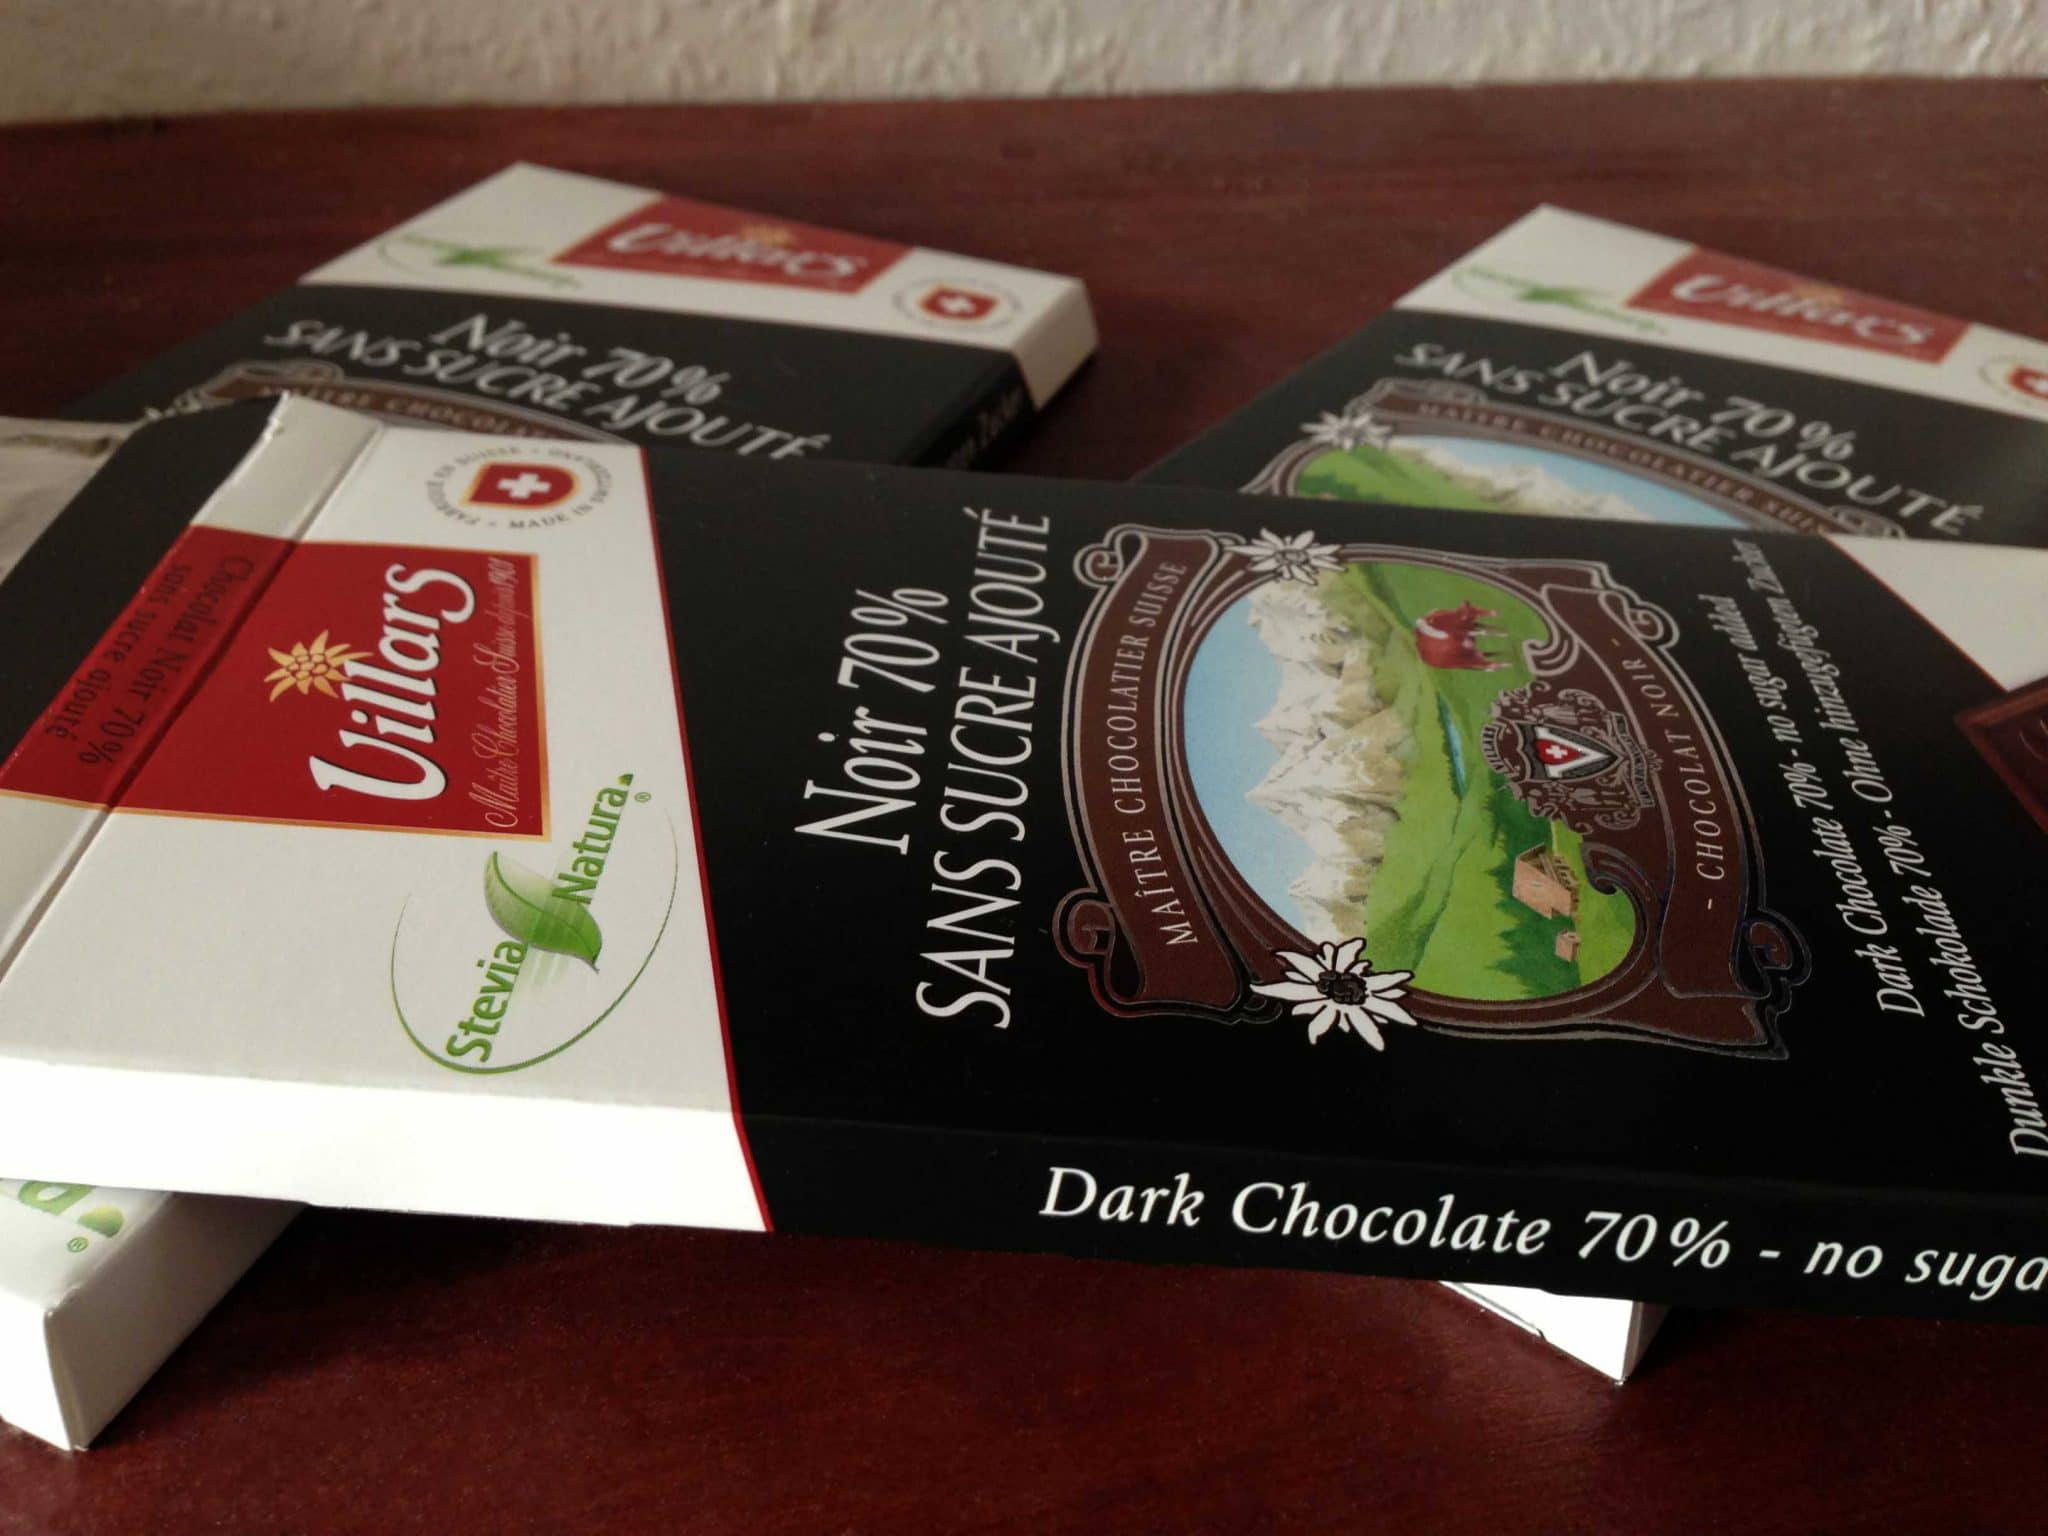 Stevia Schokolade von Villars